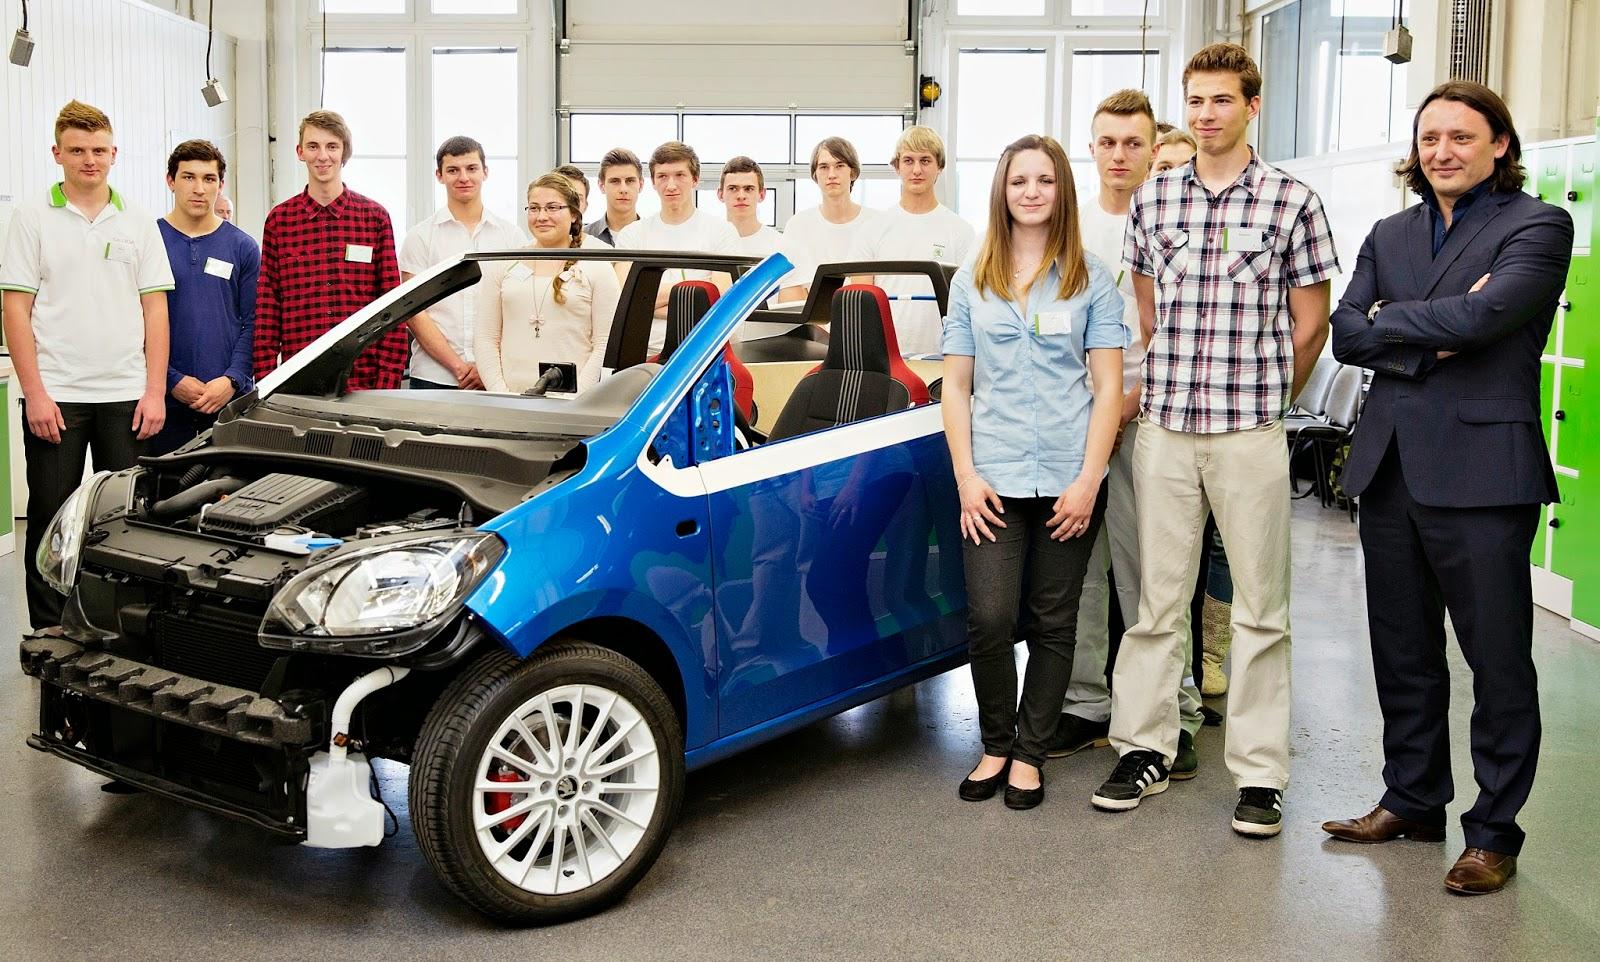 39 skoda azubi car 39 zweisitziges sport cabrio feiert. Black Bedroom Furniture Sets. Home Design Ideas